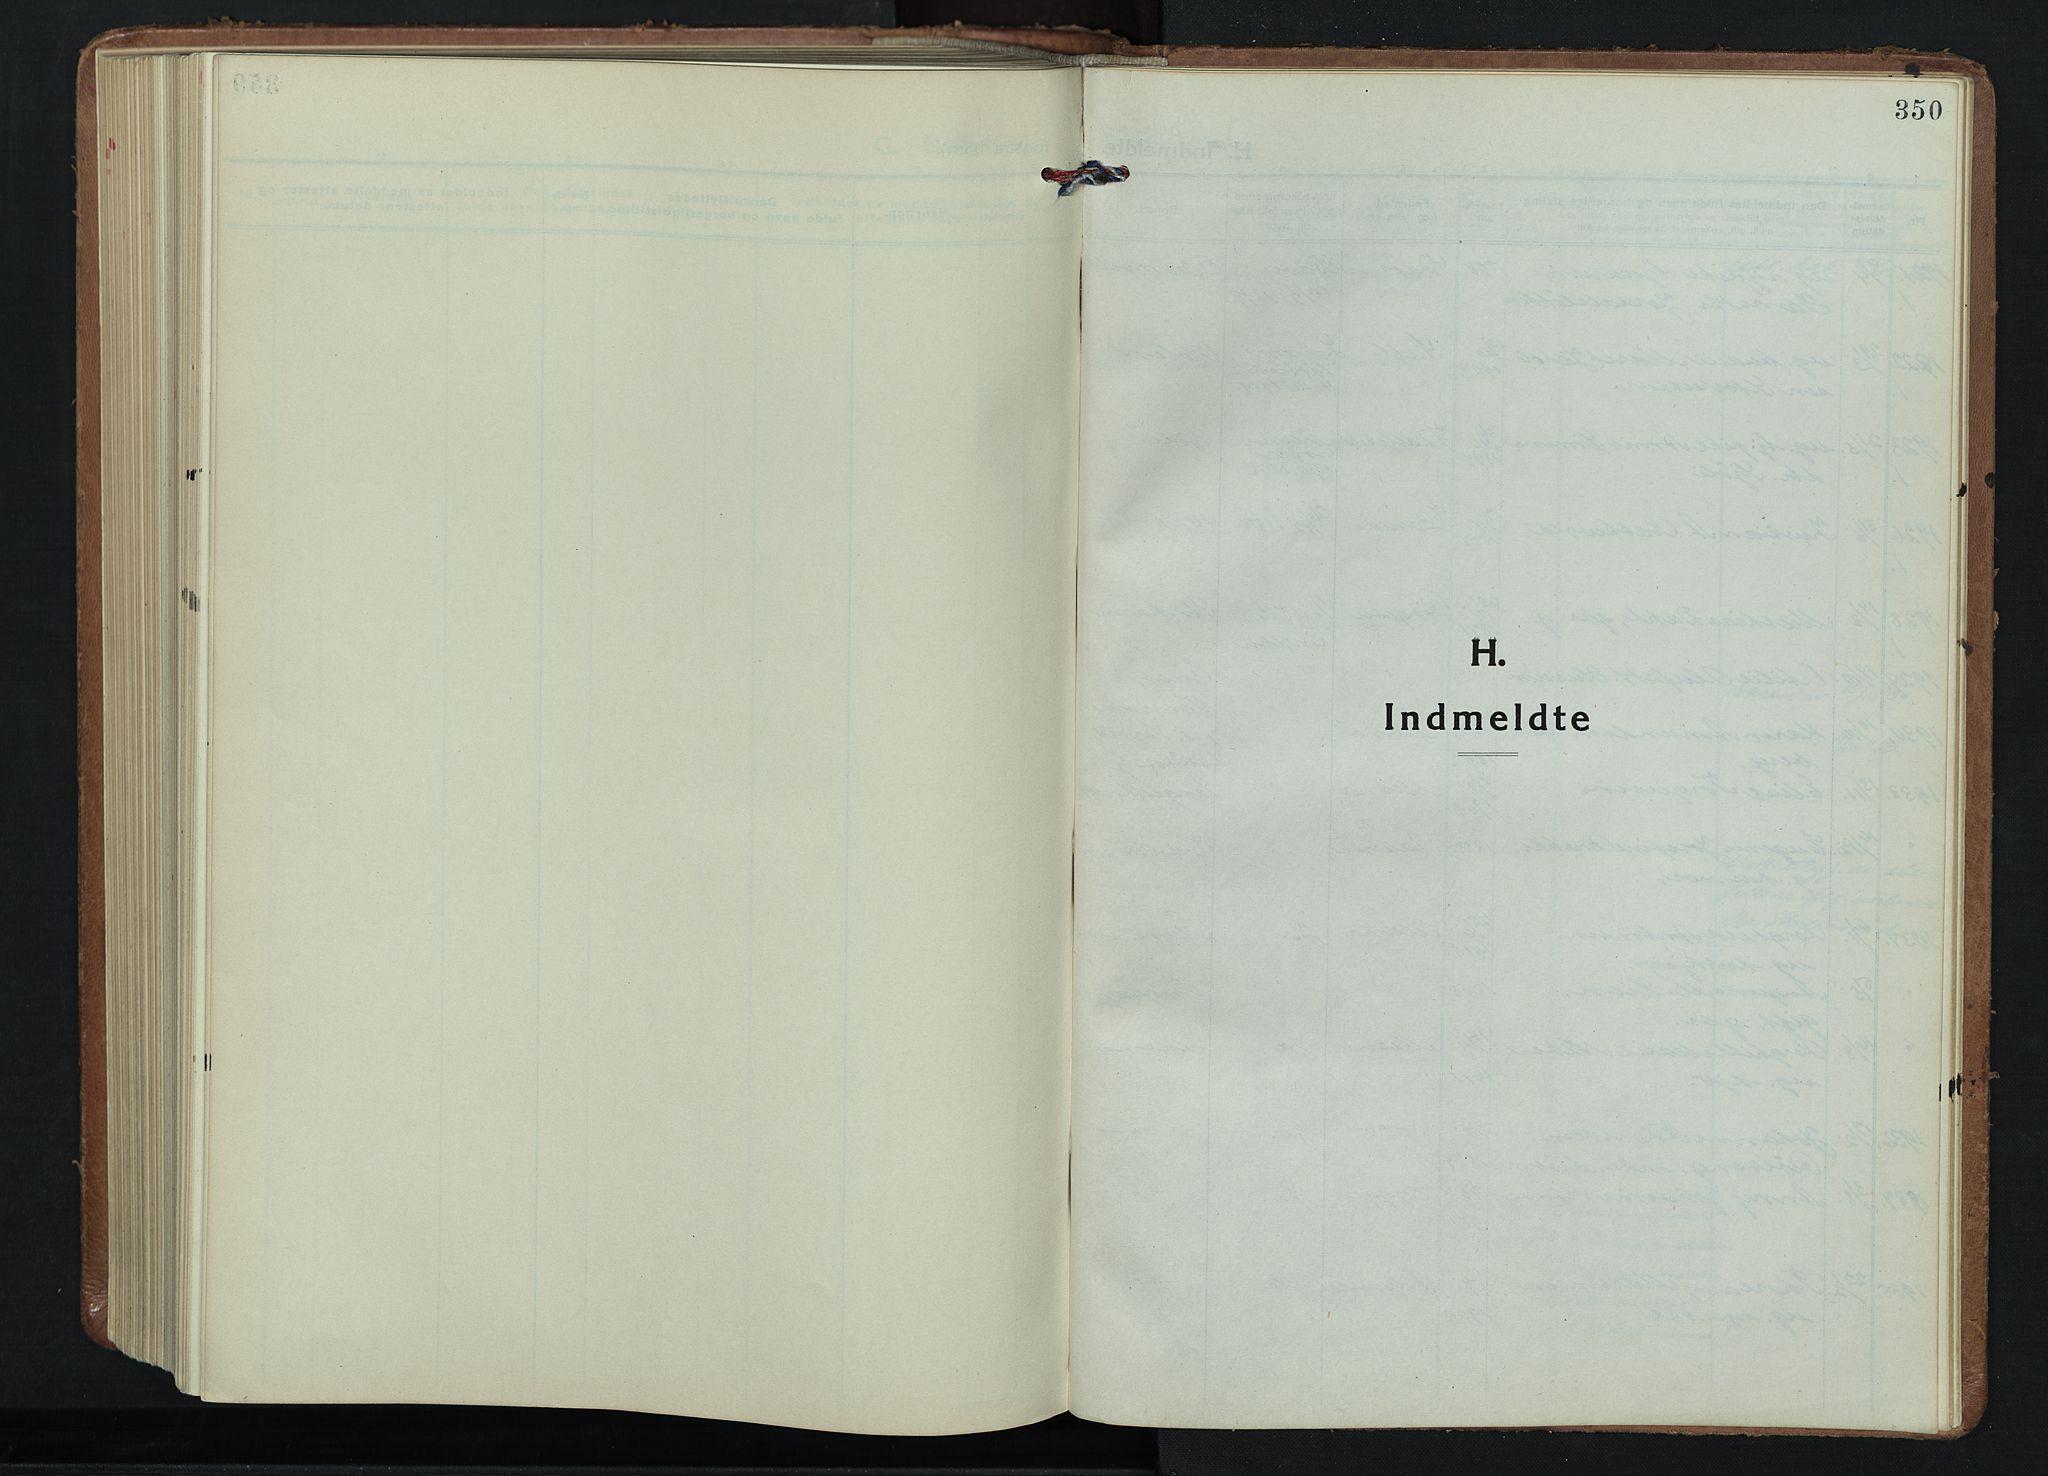 SAH, Fåberg prestekontor, Klokkerbok nr. 15, 1924-1949, s. 350